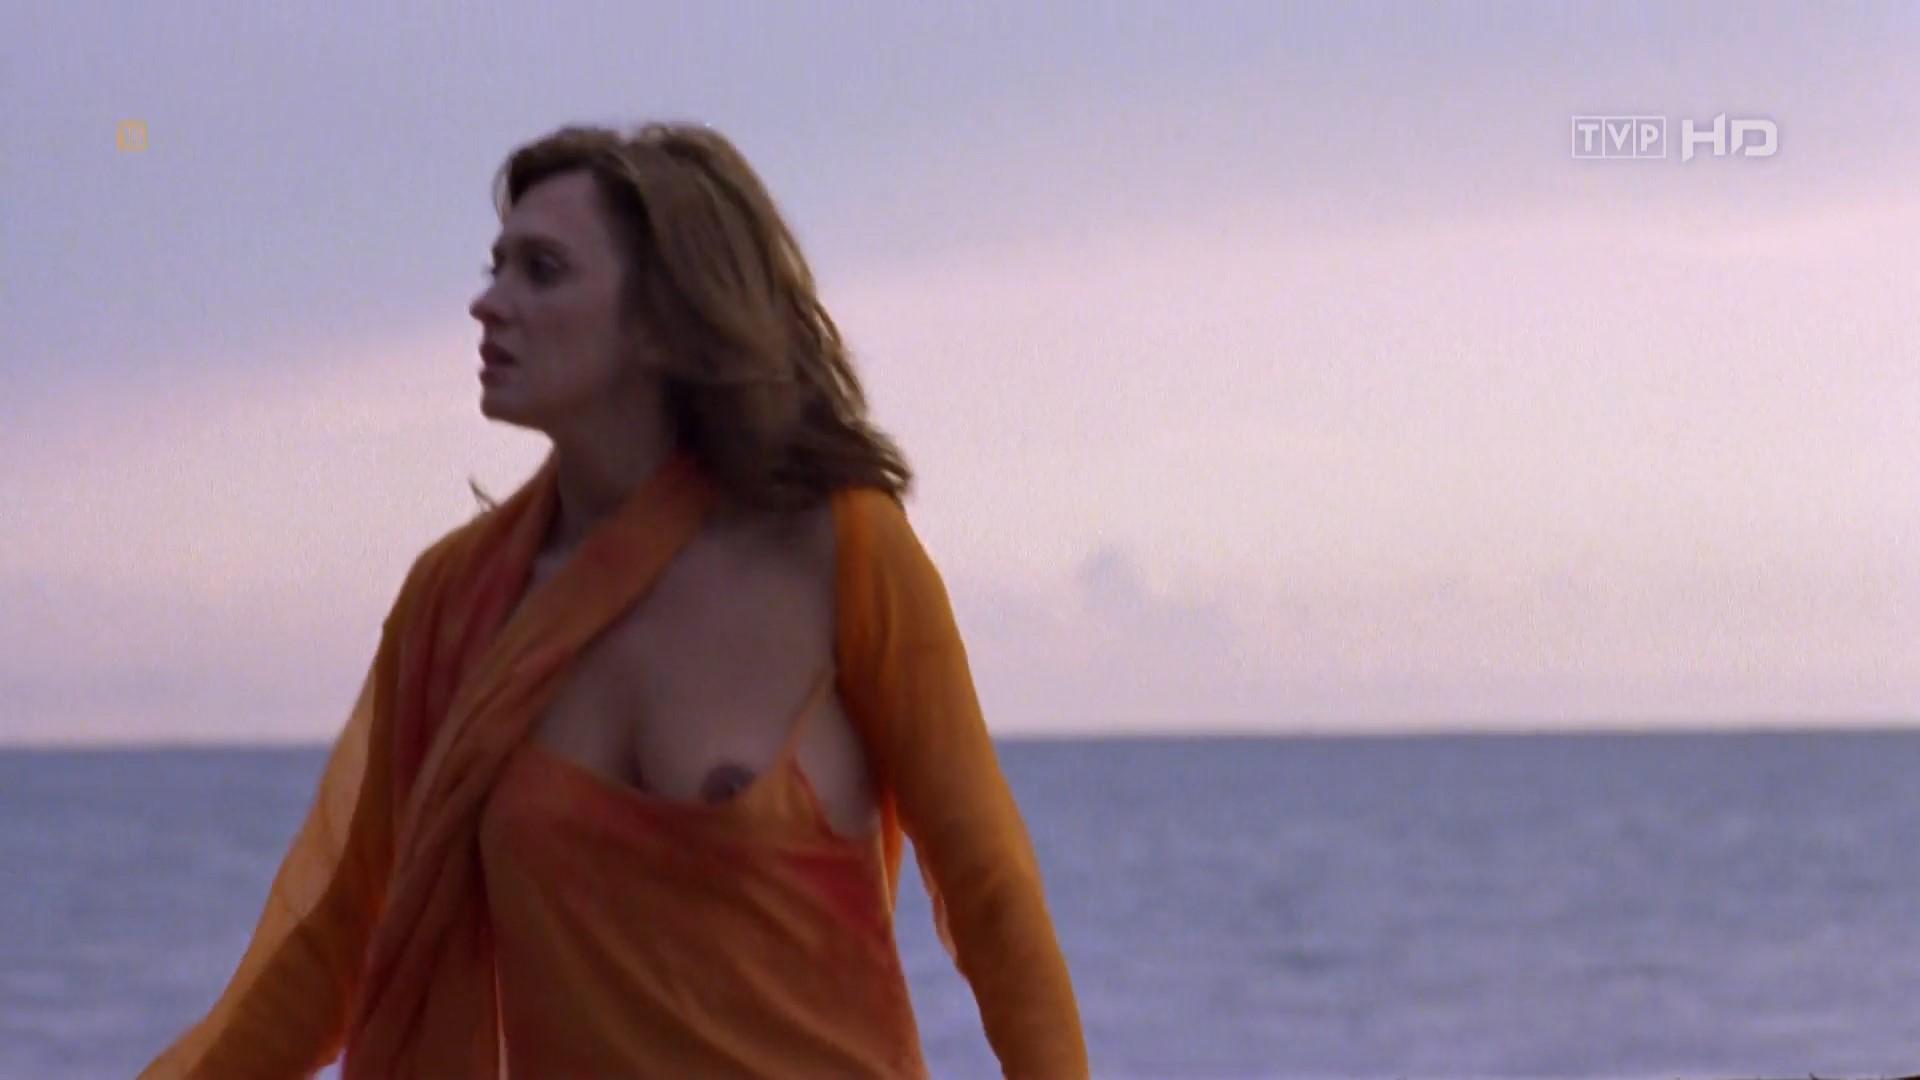 Olga drozdova nude